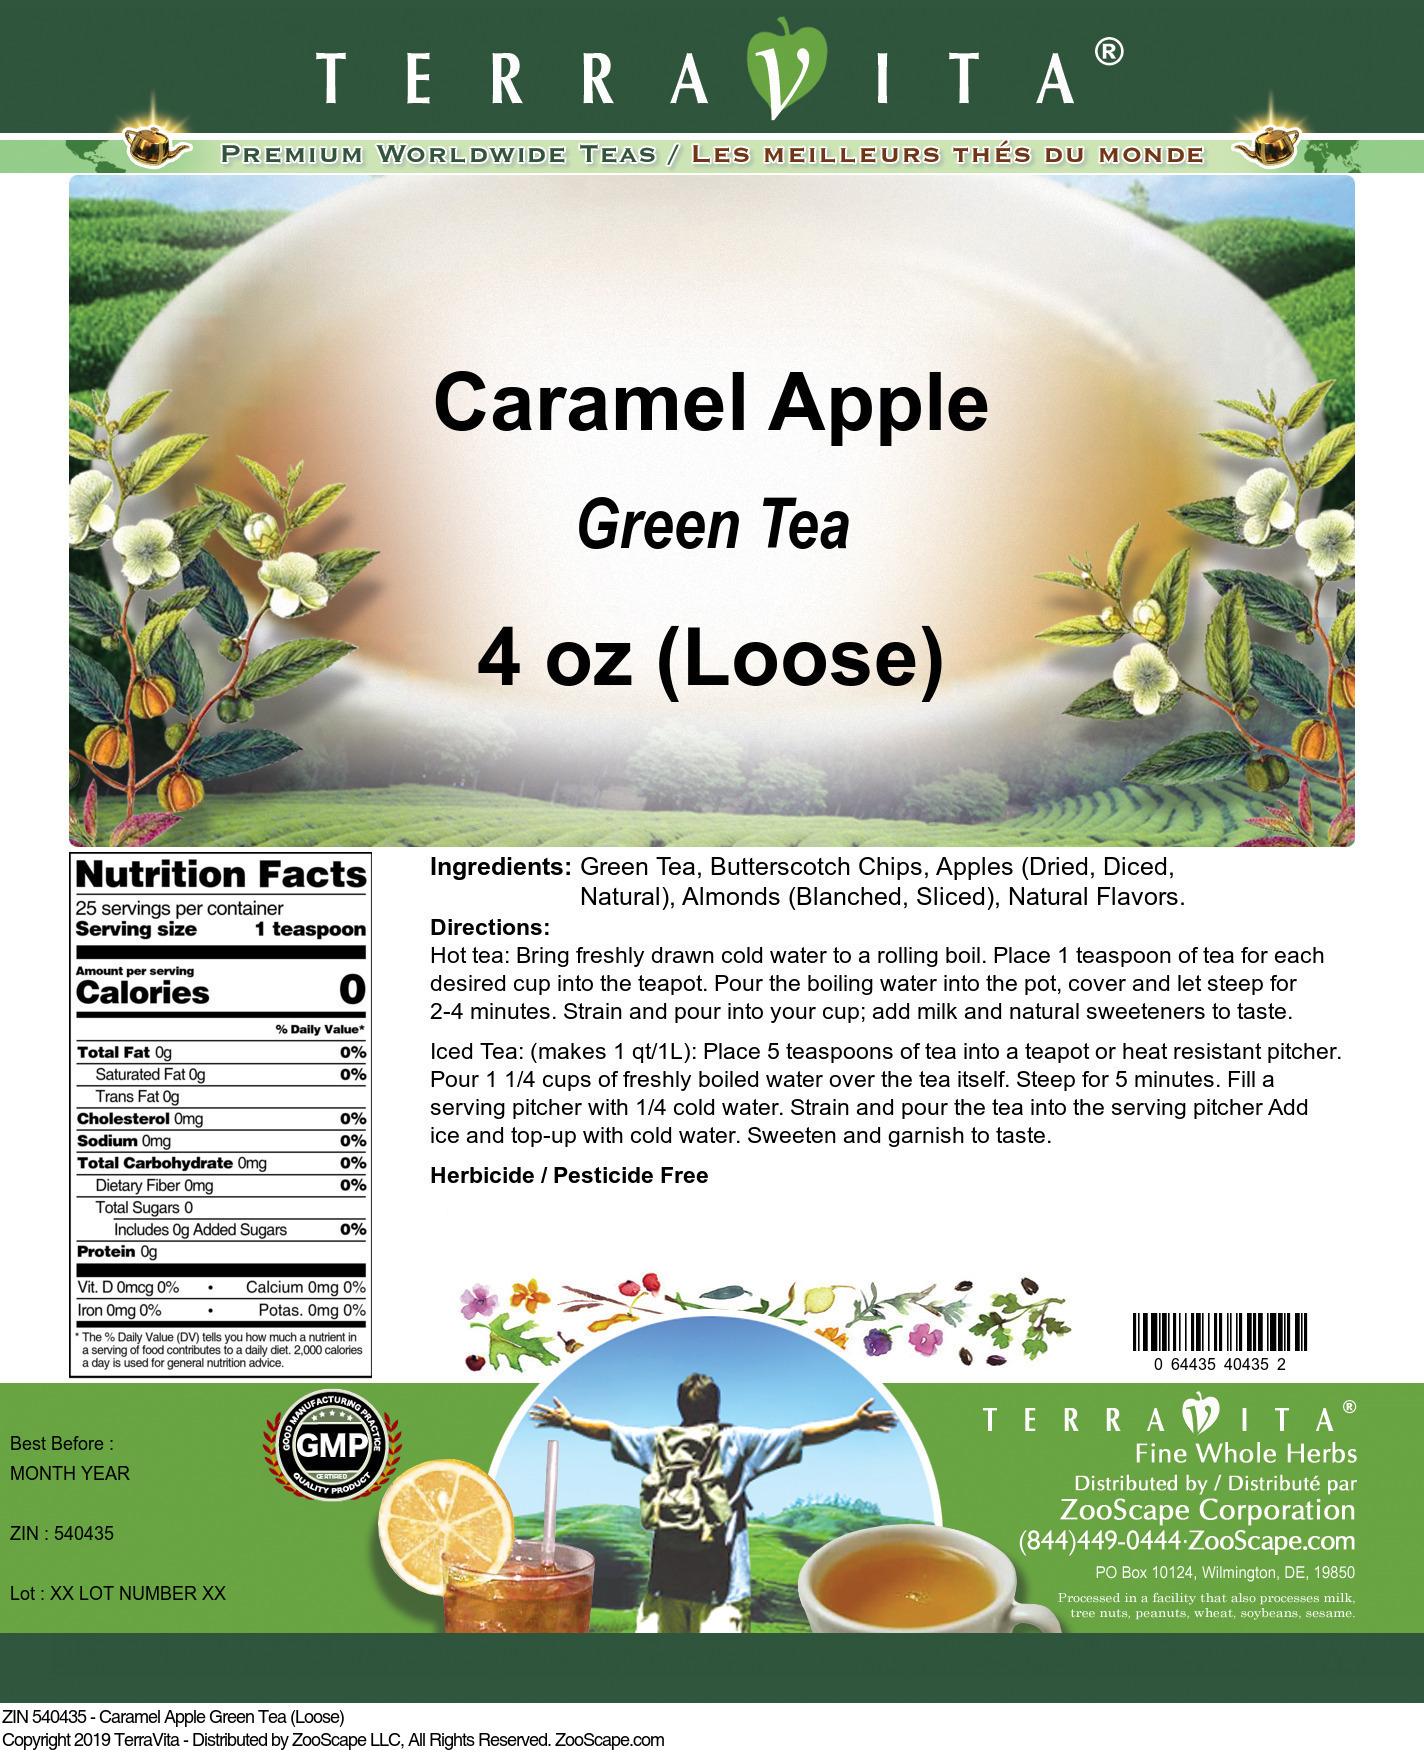 Caramel Apple Green Tea